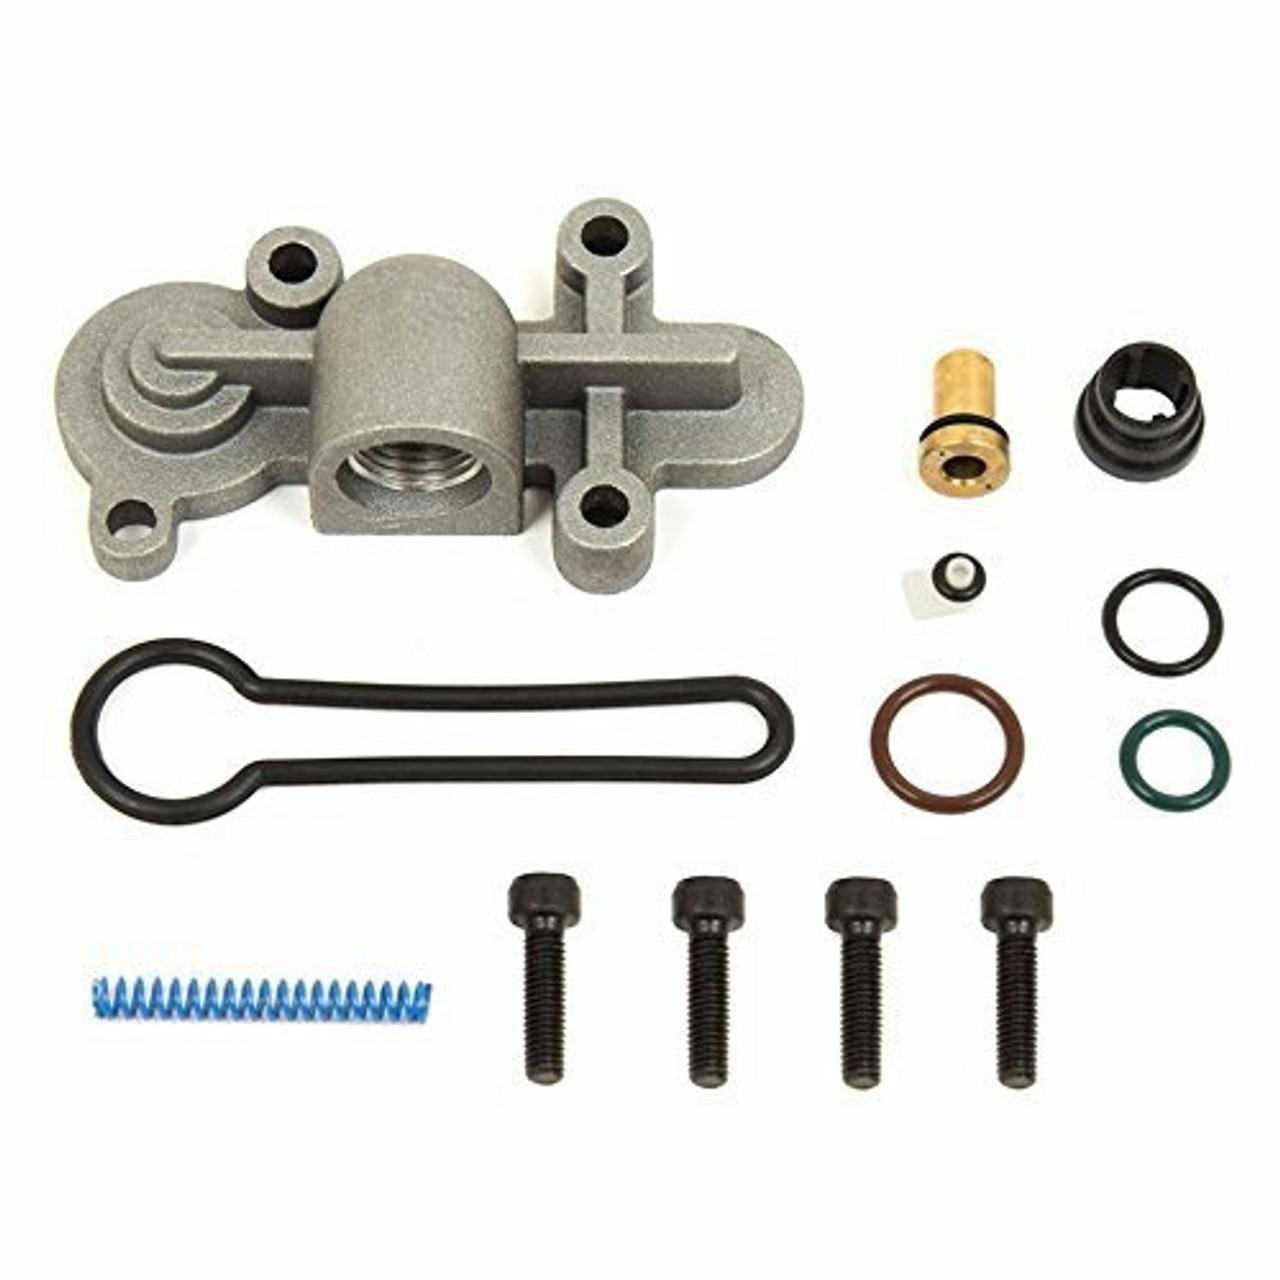 For 03-07 Ford 6.0L Blue Spring Fuel Pressure Regulator Kit Powerstroke Diesel